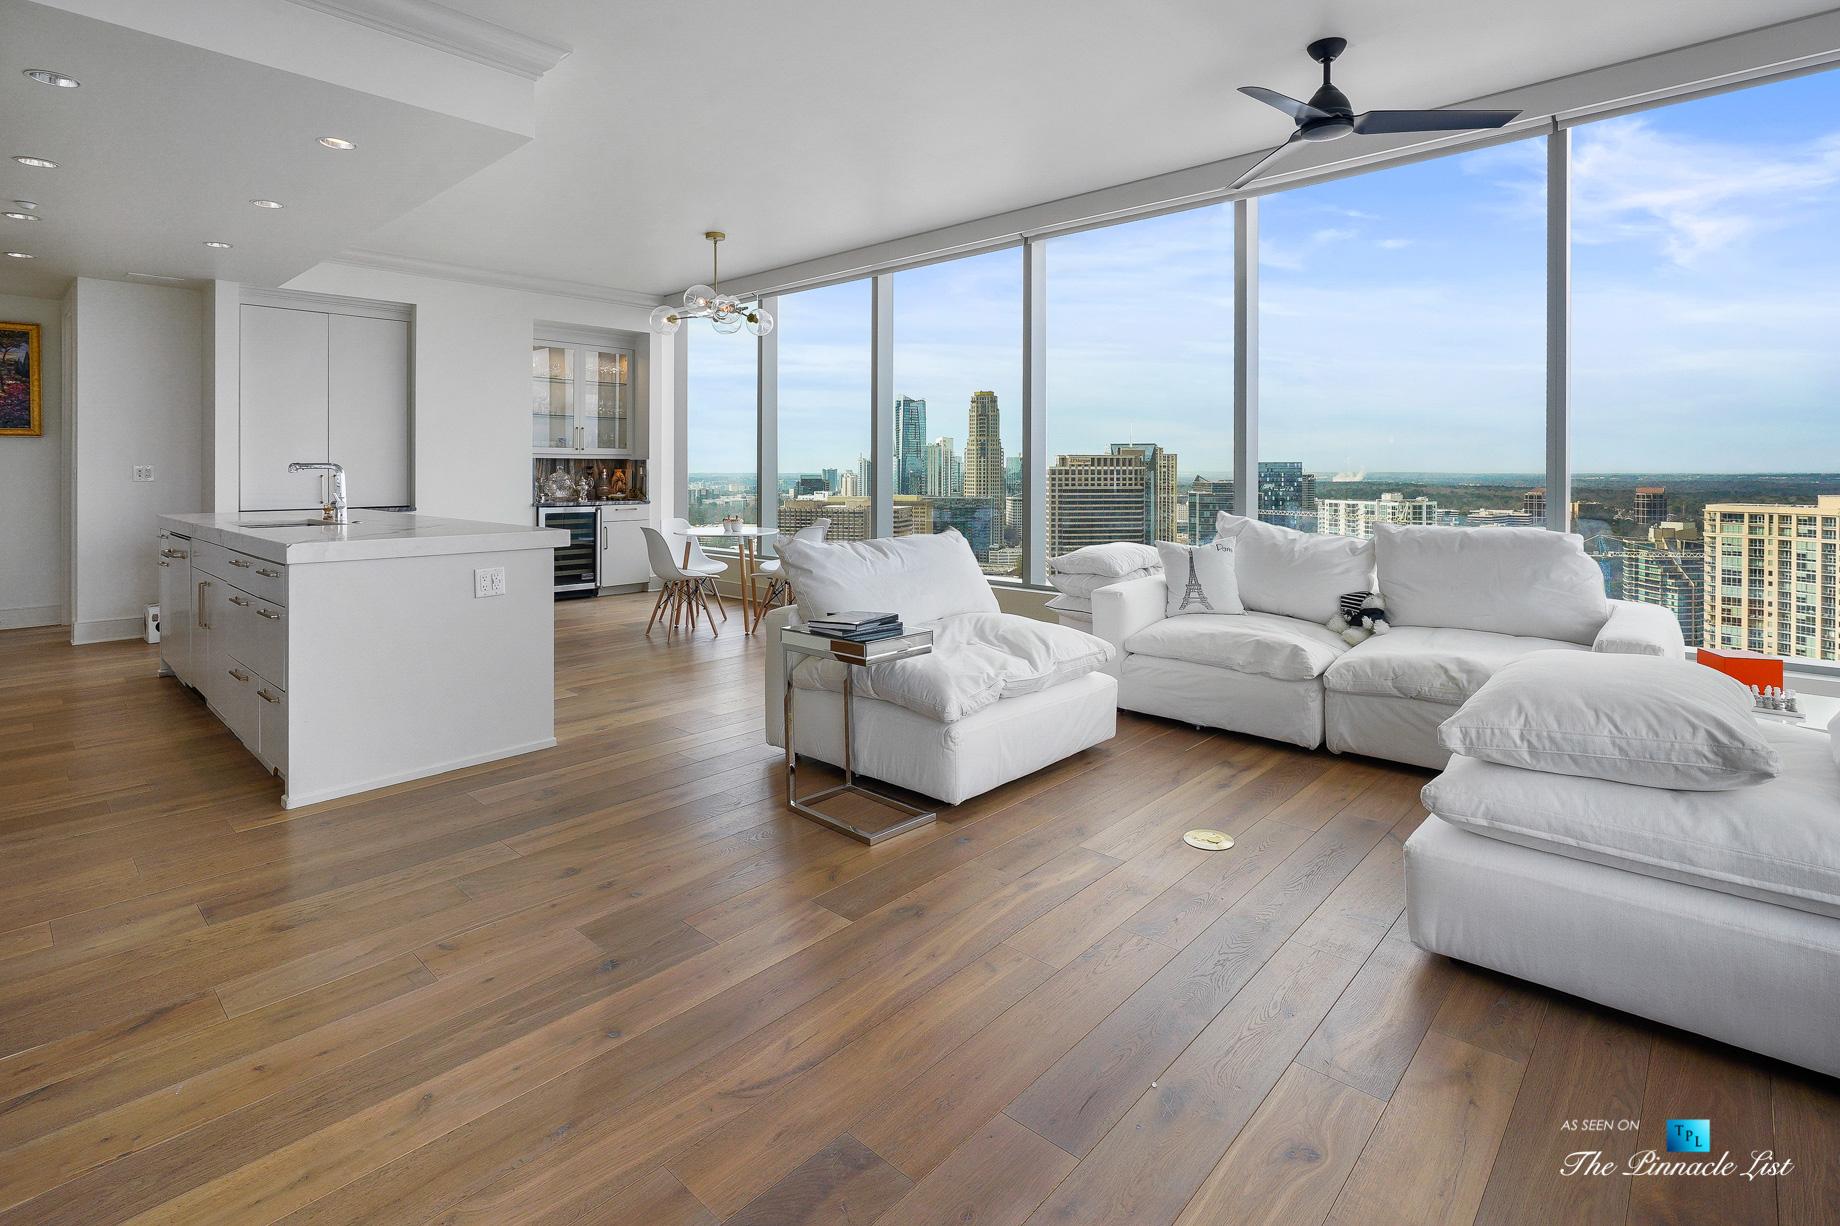 3630 Peachtree Rd NE, Unit 2307, Atlanta, GA, USA – Apartment Living Area – Luxury Real Estate – Ritz-Carlton Residences Buckhead